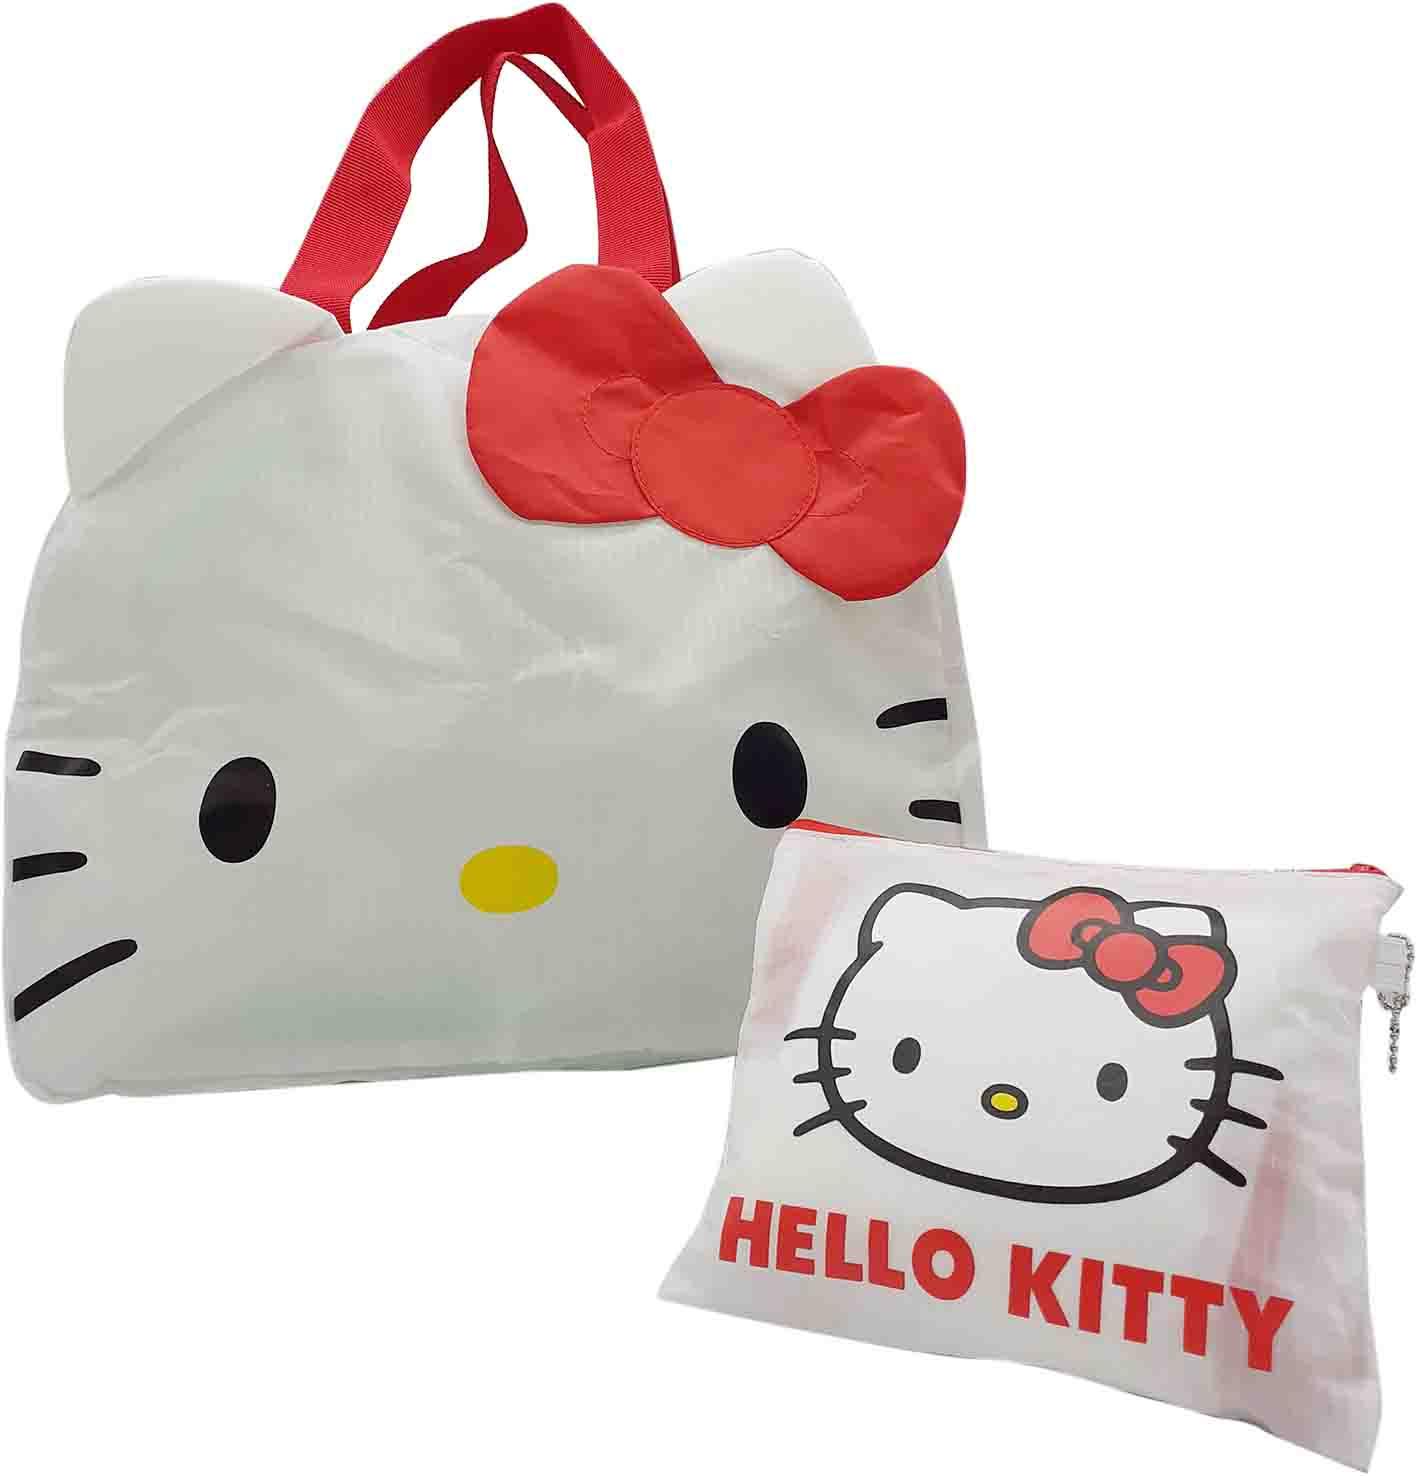 Hello kitty造型輕便折疊袋